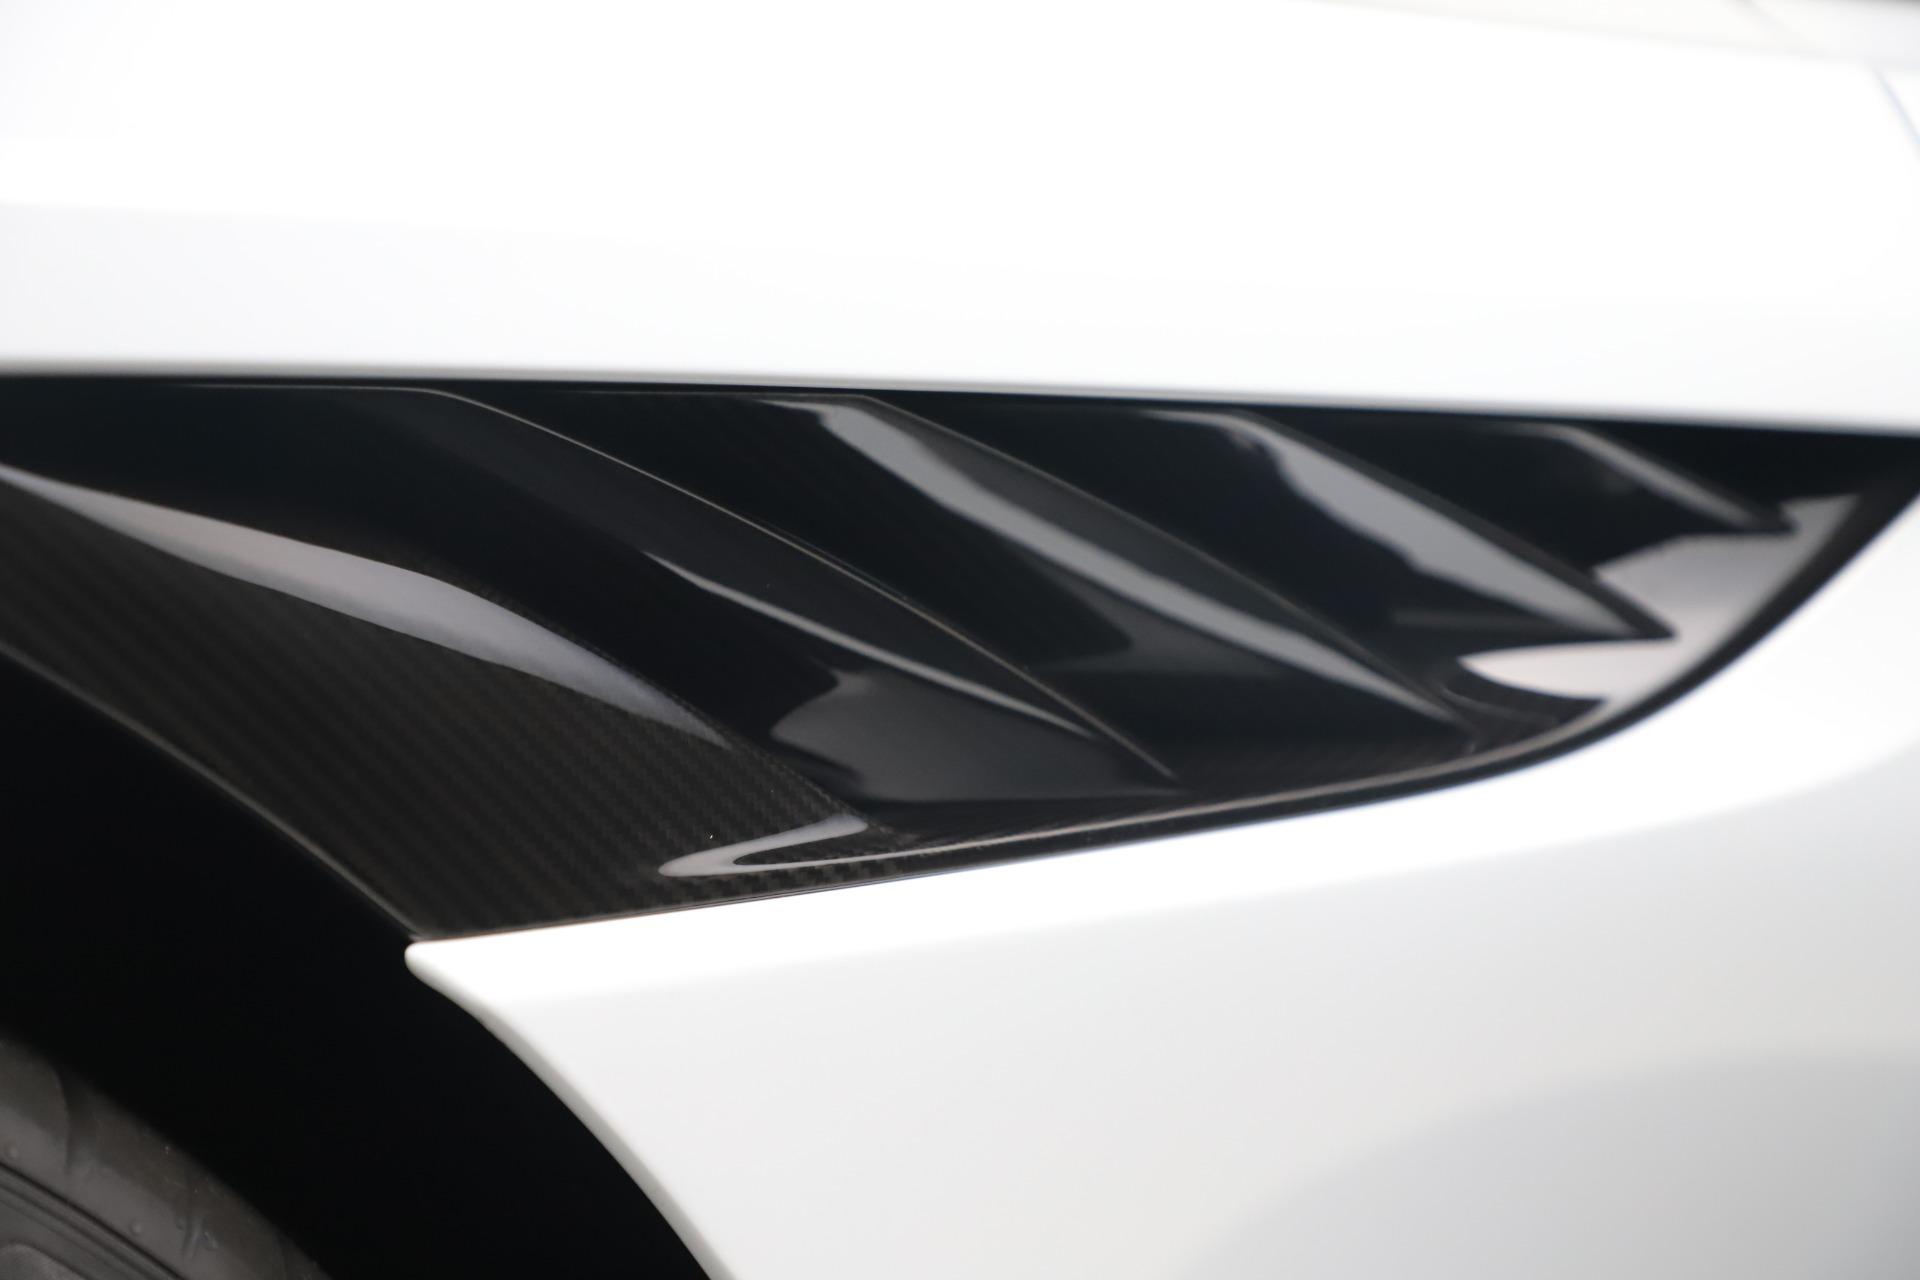 New 2020 Aston Martin DBS Superleggera For Sale 416881 In Greenwich, CT